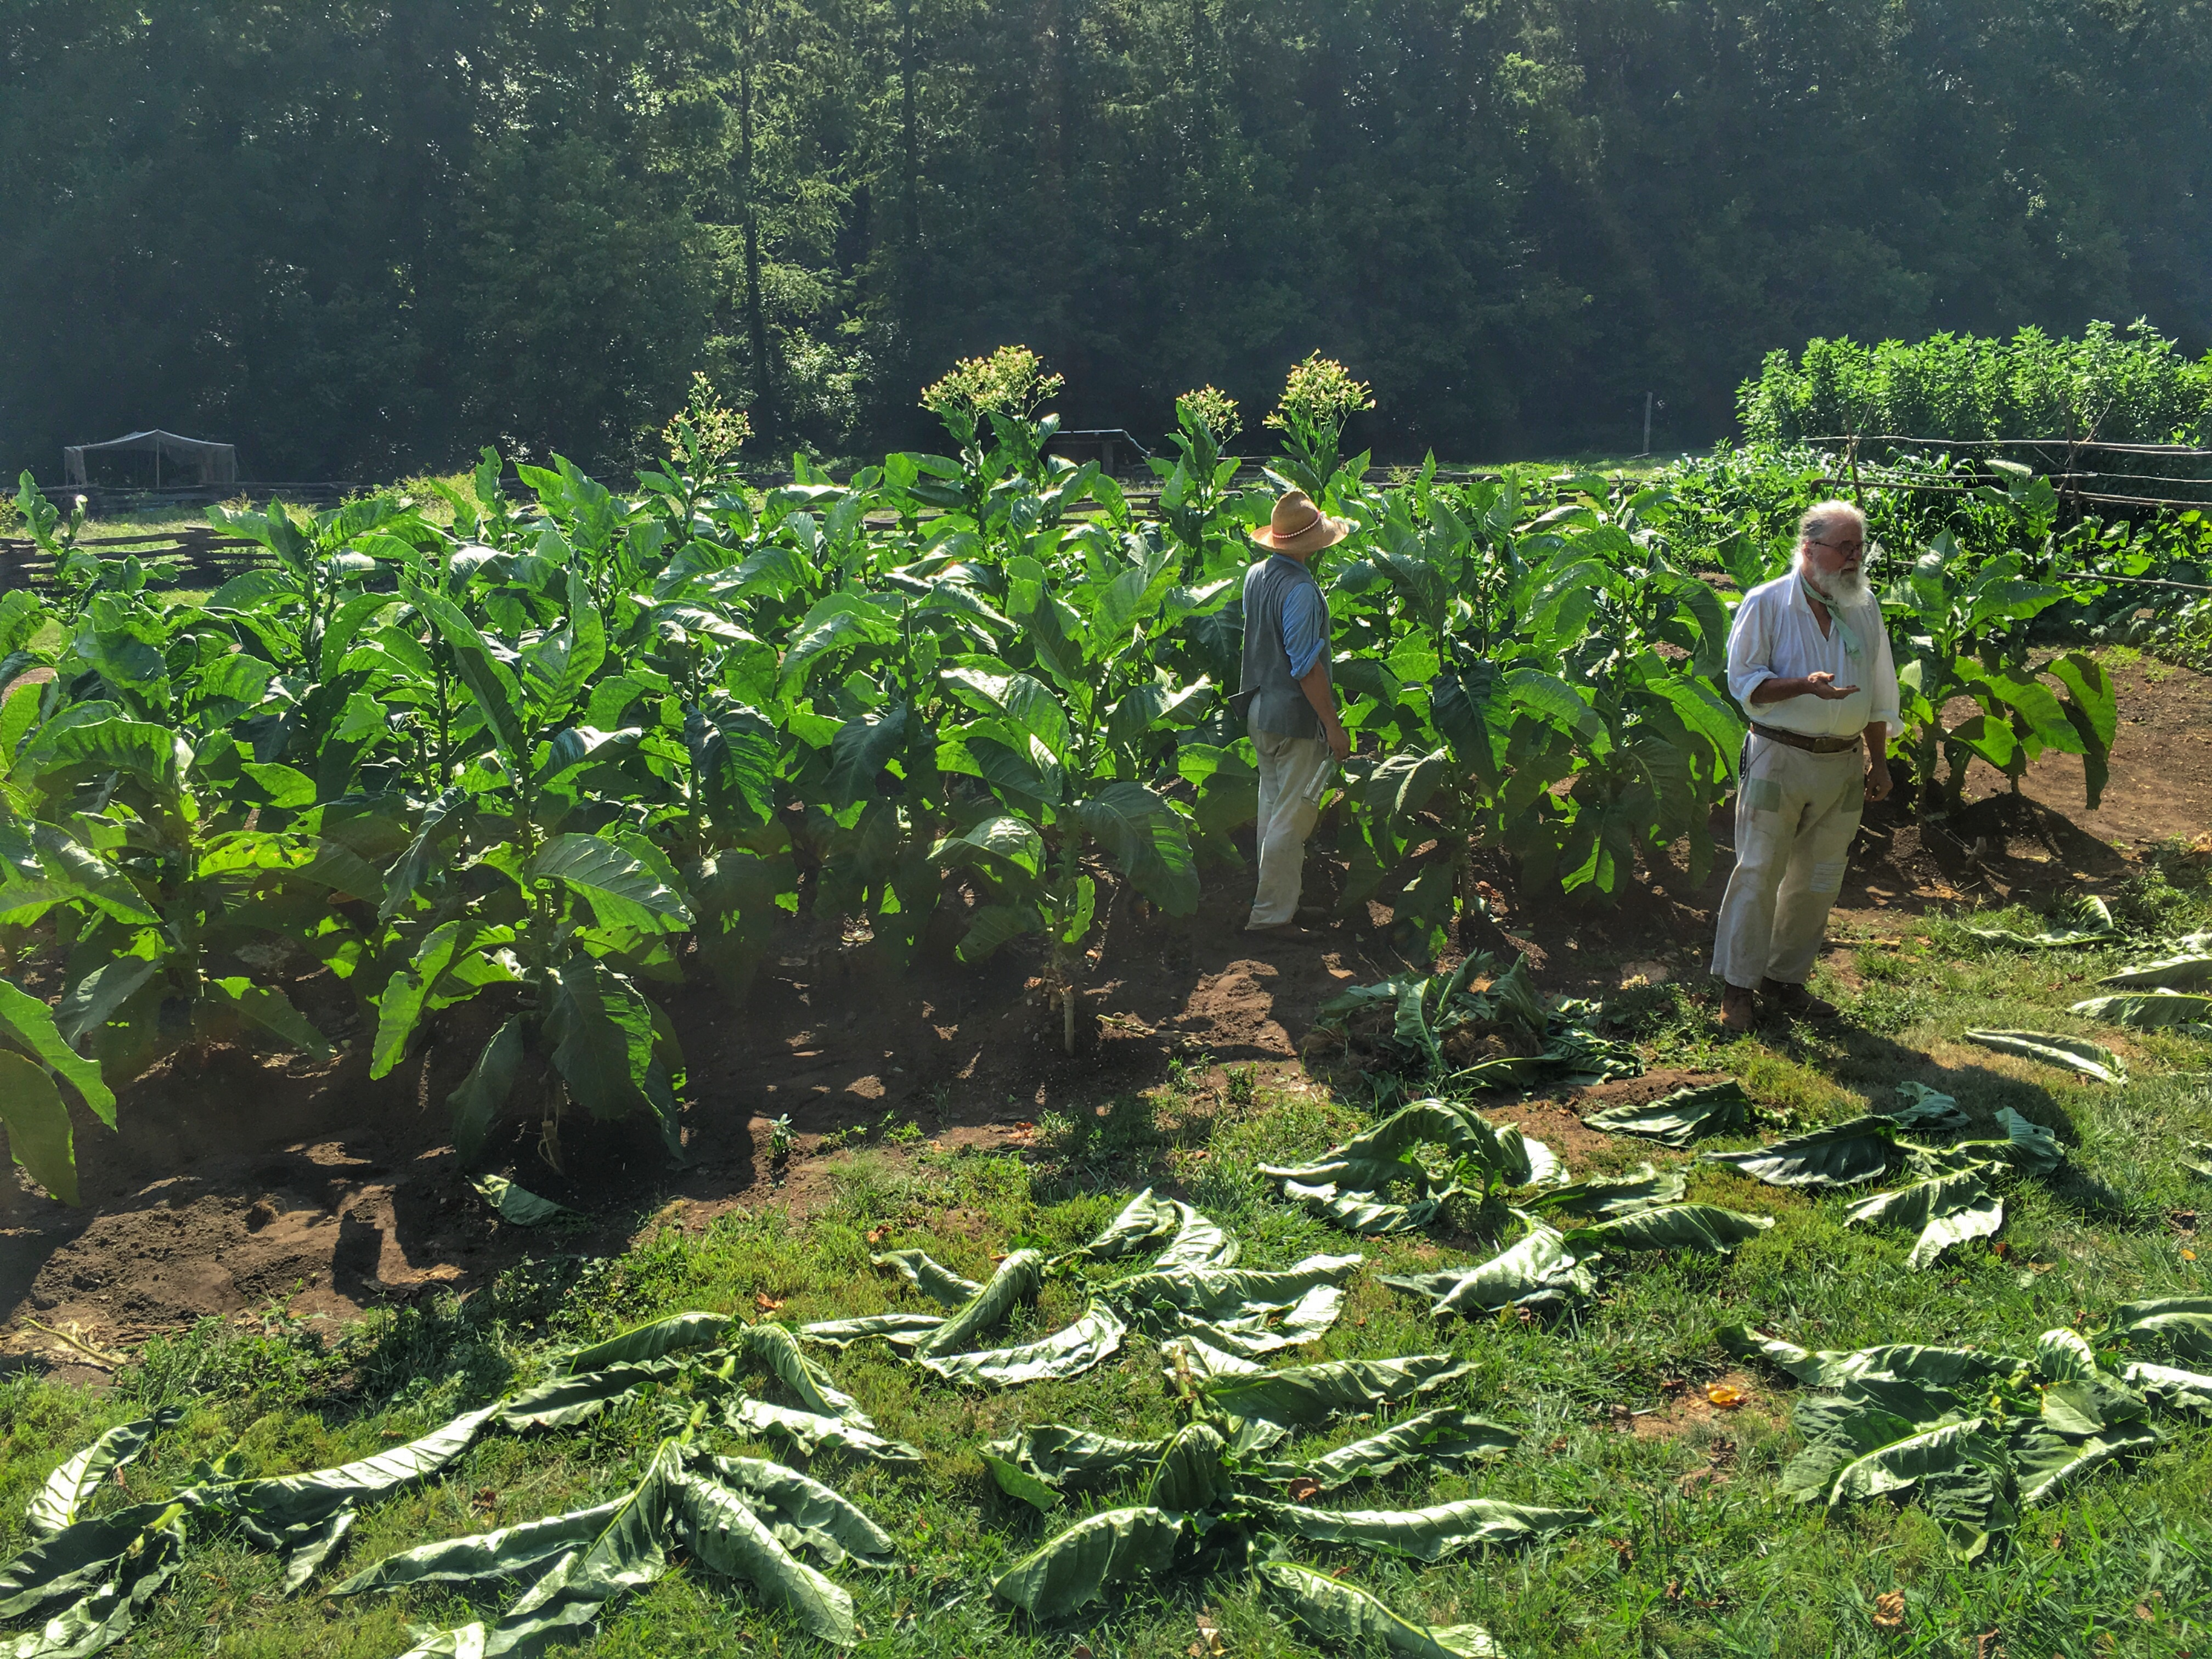 Harvesting tobacco at Mount Vernon's Farm.